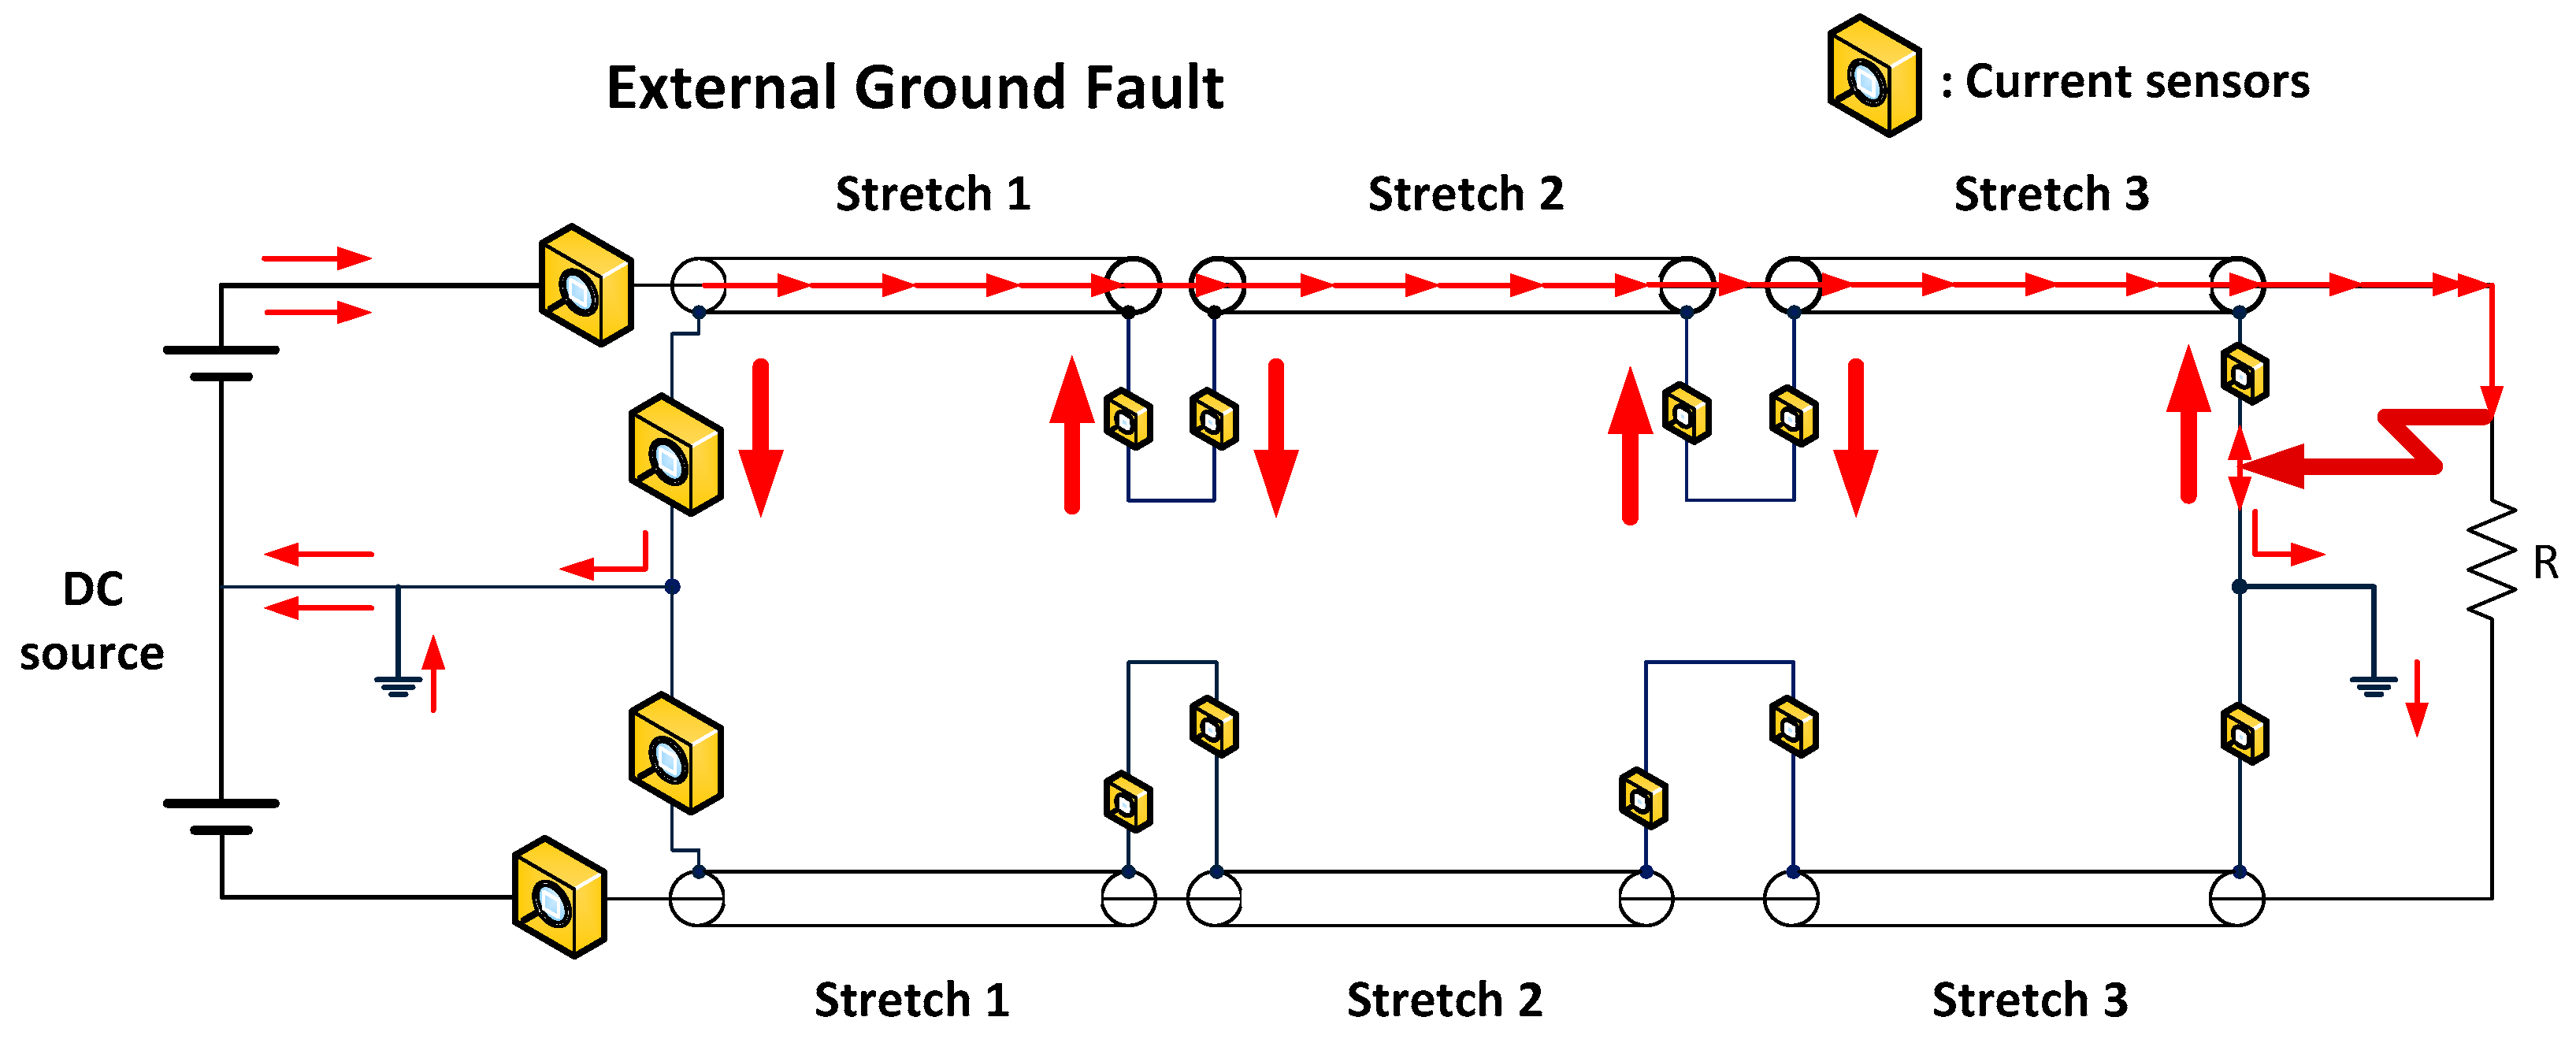 ep0483164b1 a ground fault circuit interrupter google patents rh ashleyhold artist info